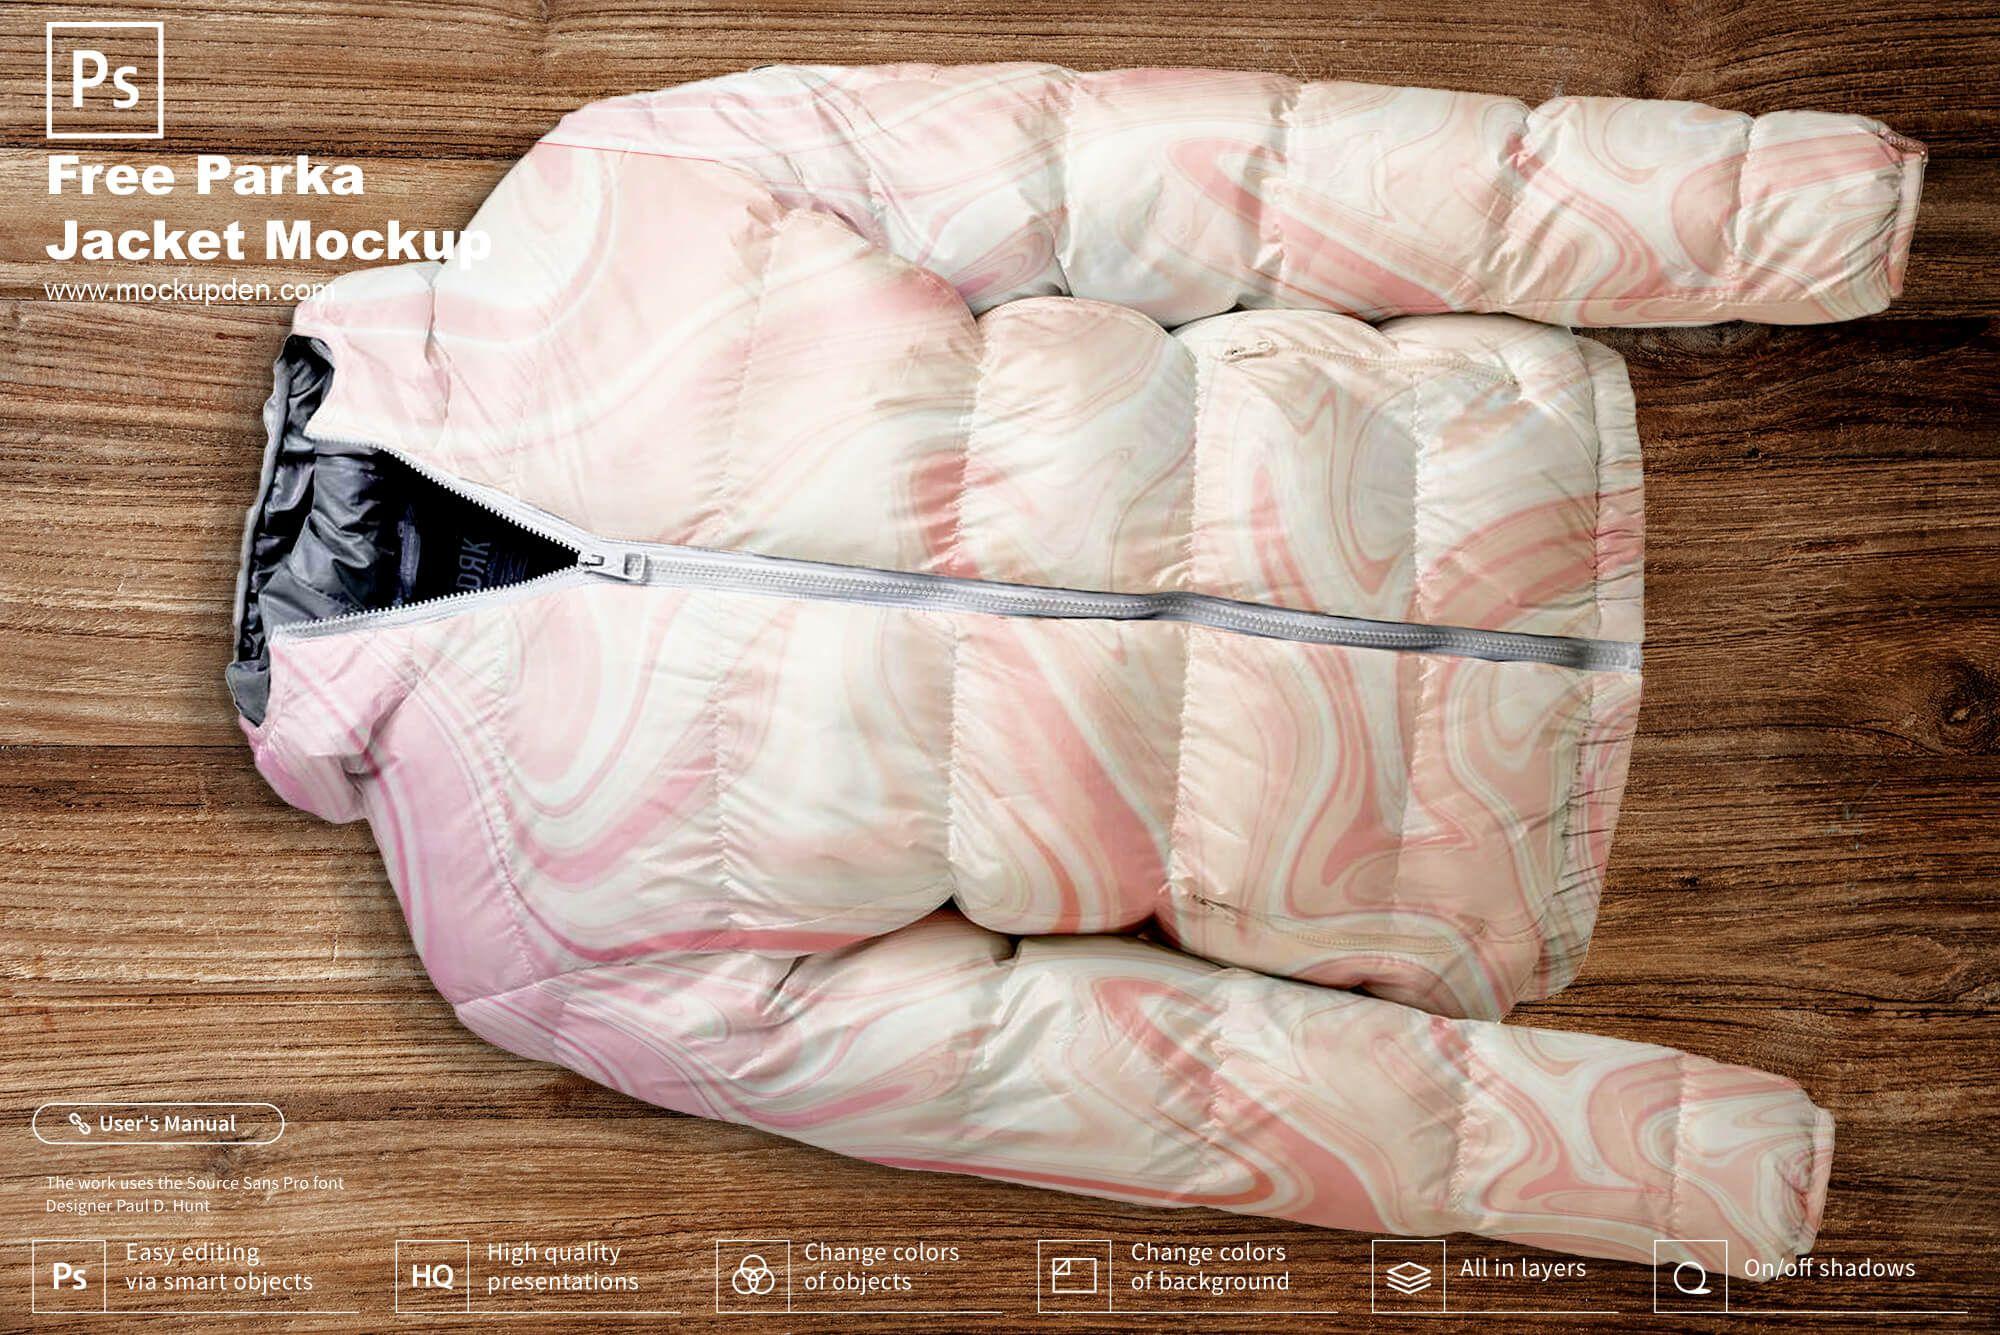 Download Free Parka Jacket Mockup Psd Template Parka Jacket Clothing Mockup Mockup Psd